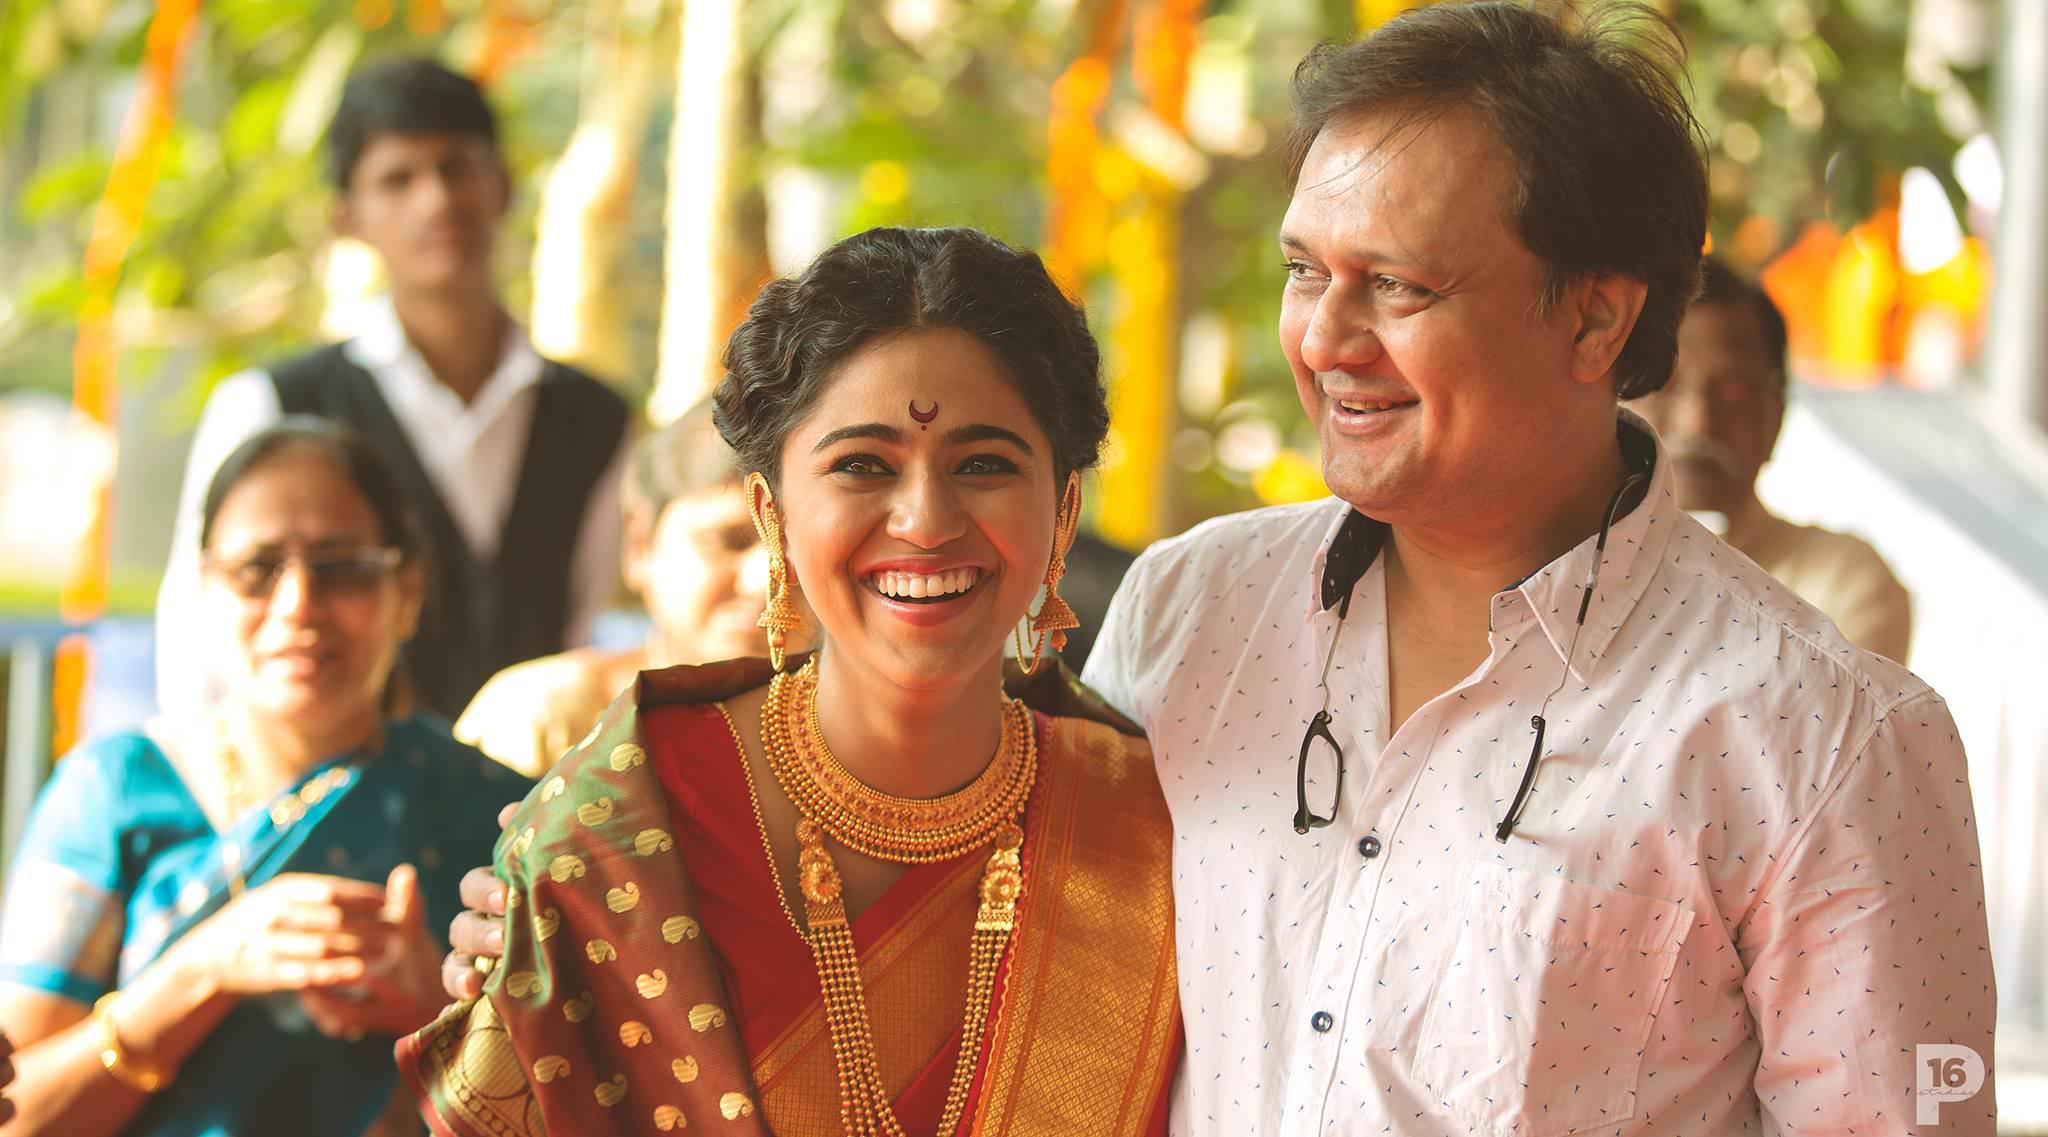 radha swami dinod photo DIdQND